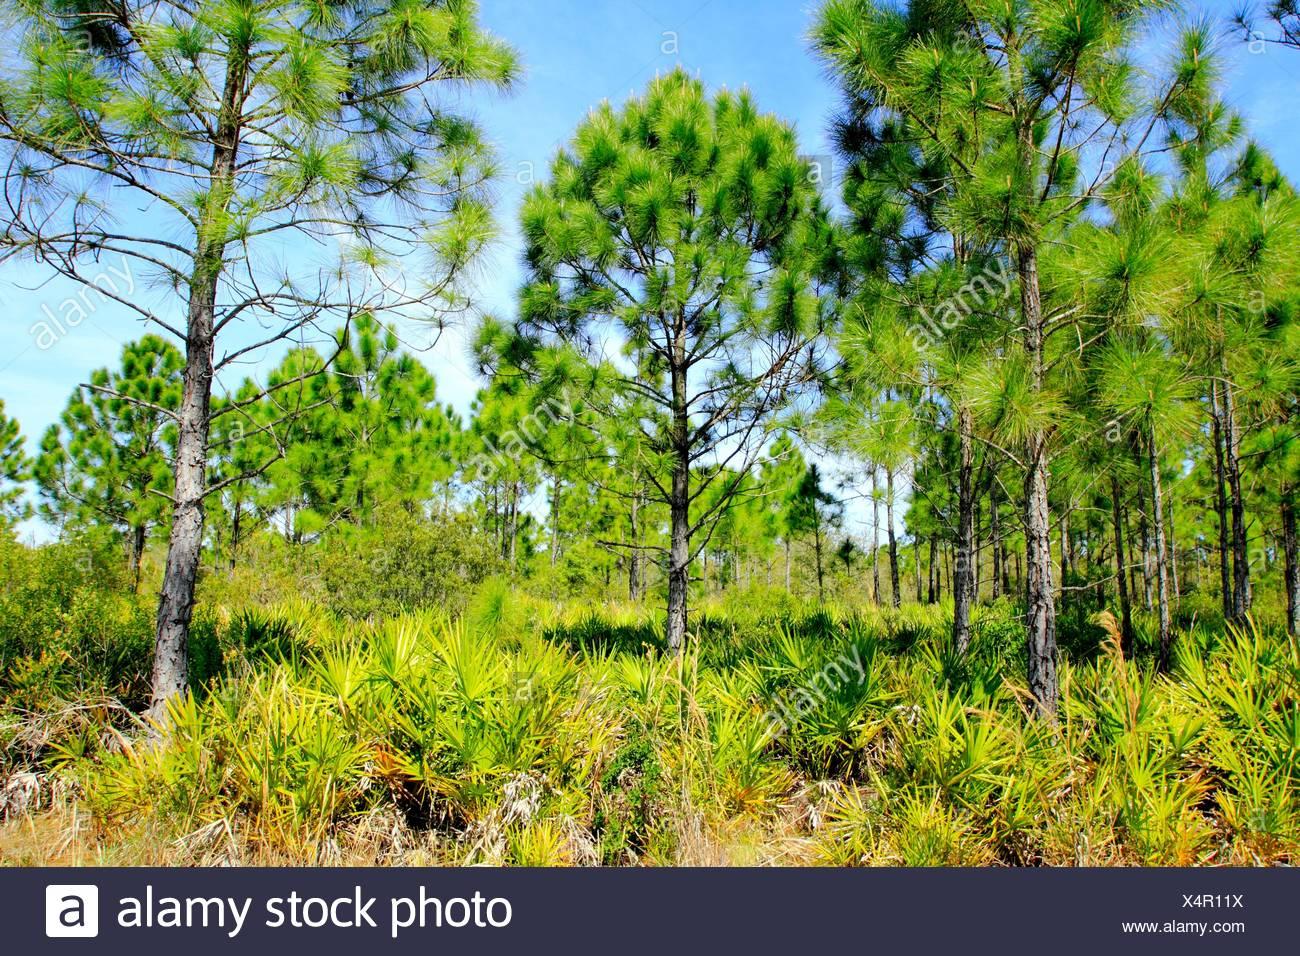 Pine Flatwoods ecosystem Florida USA - Stock Image